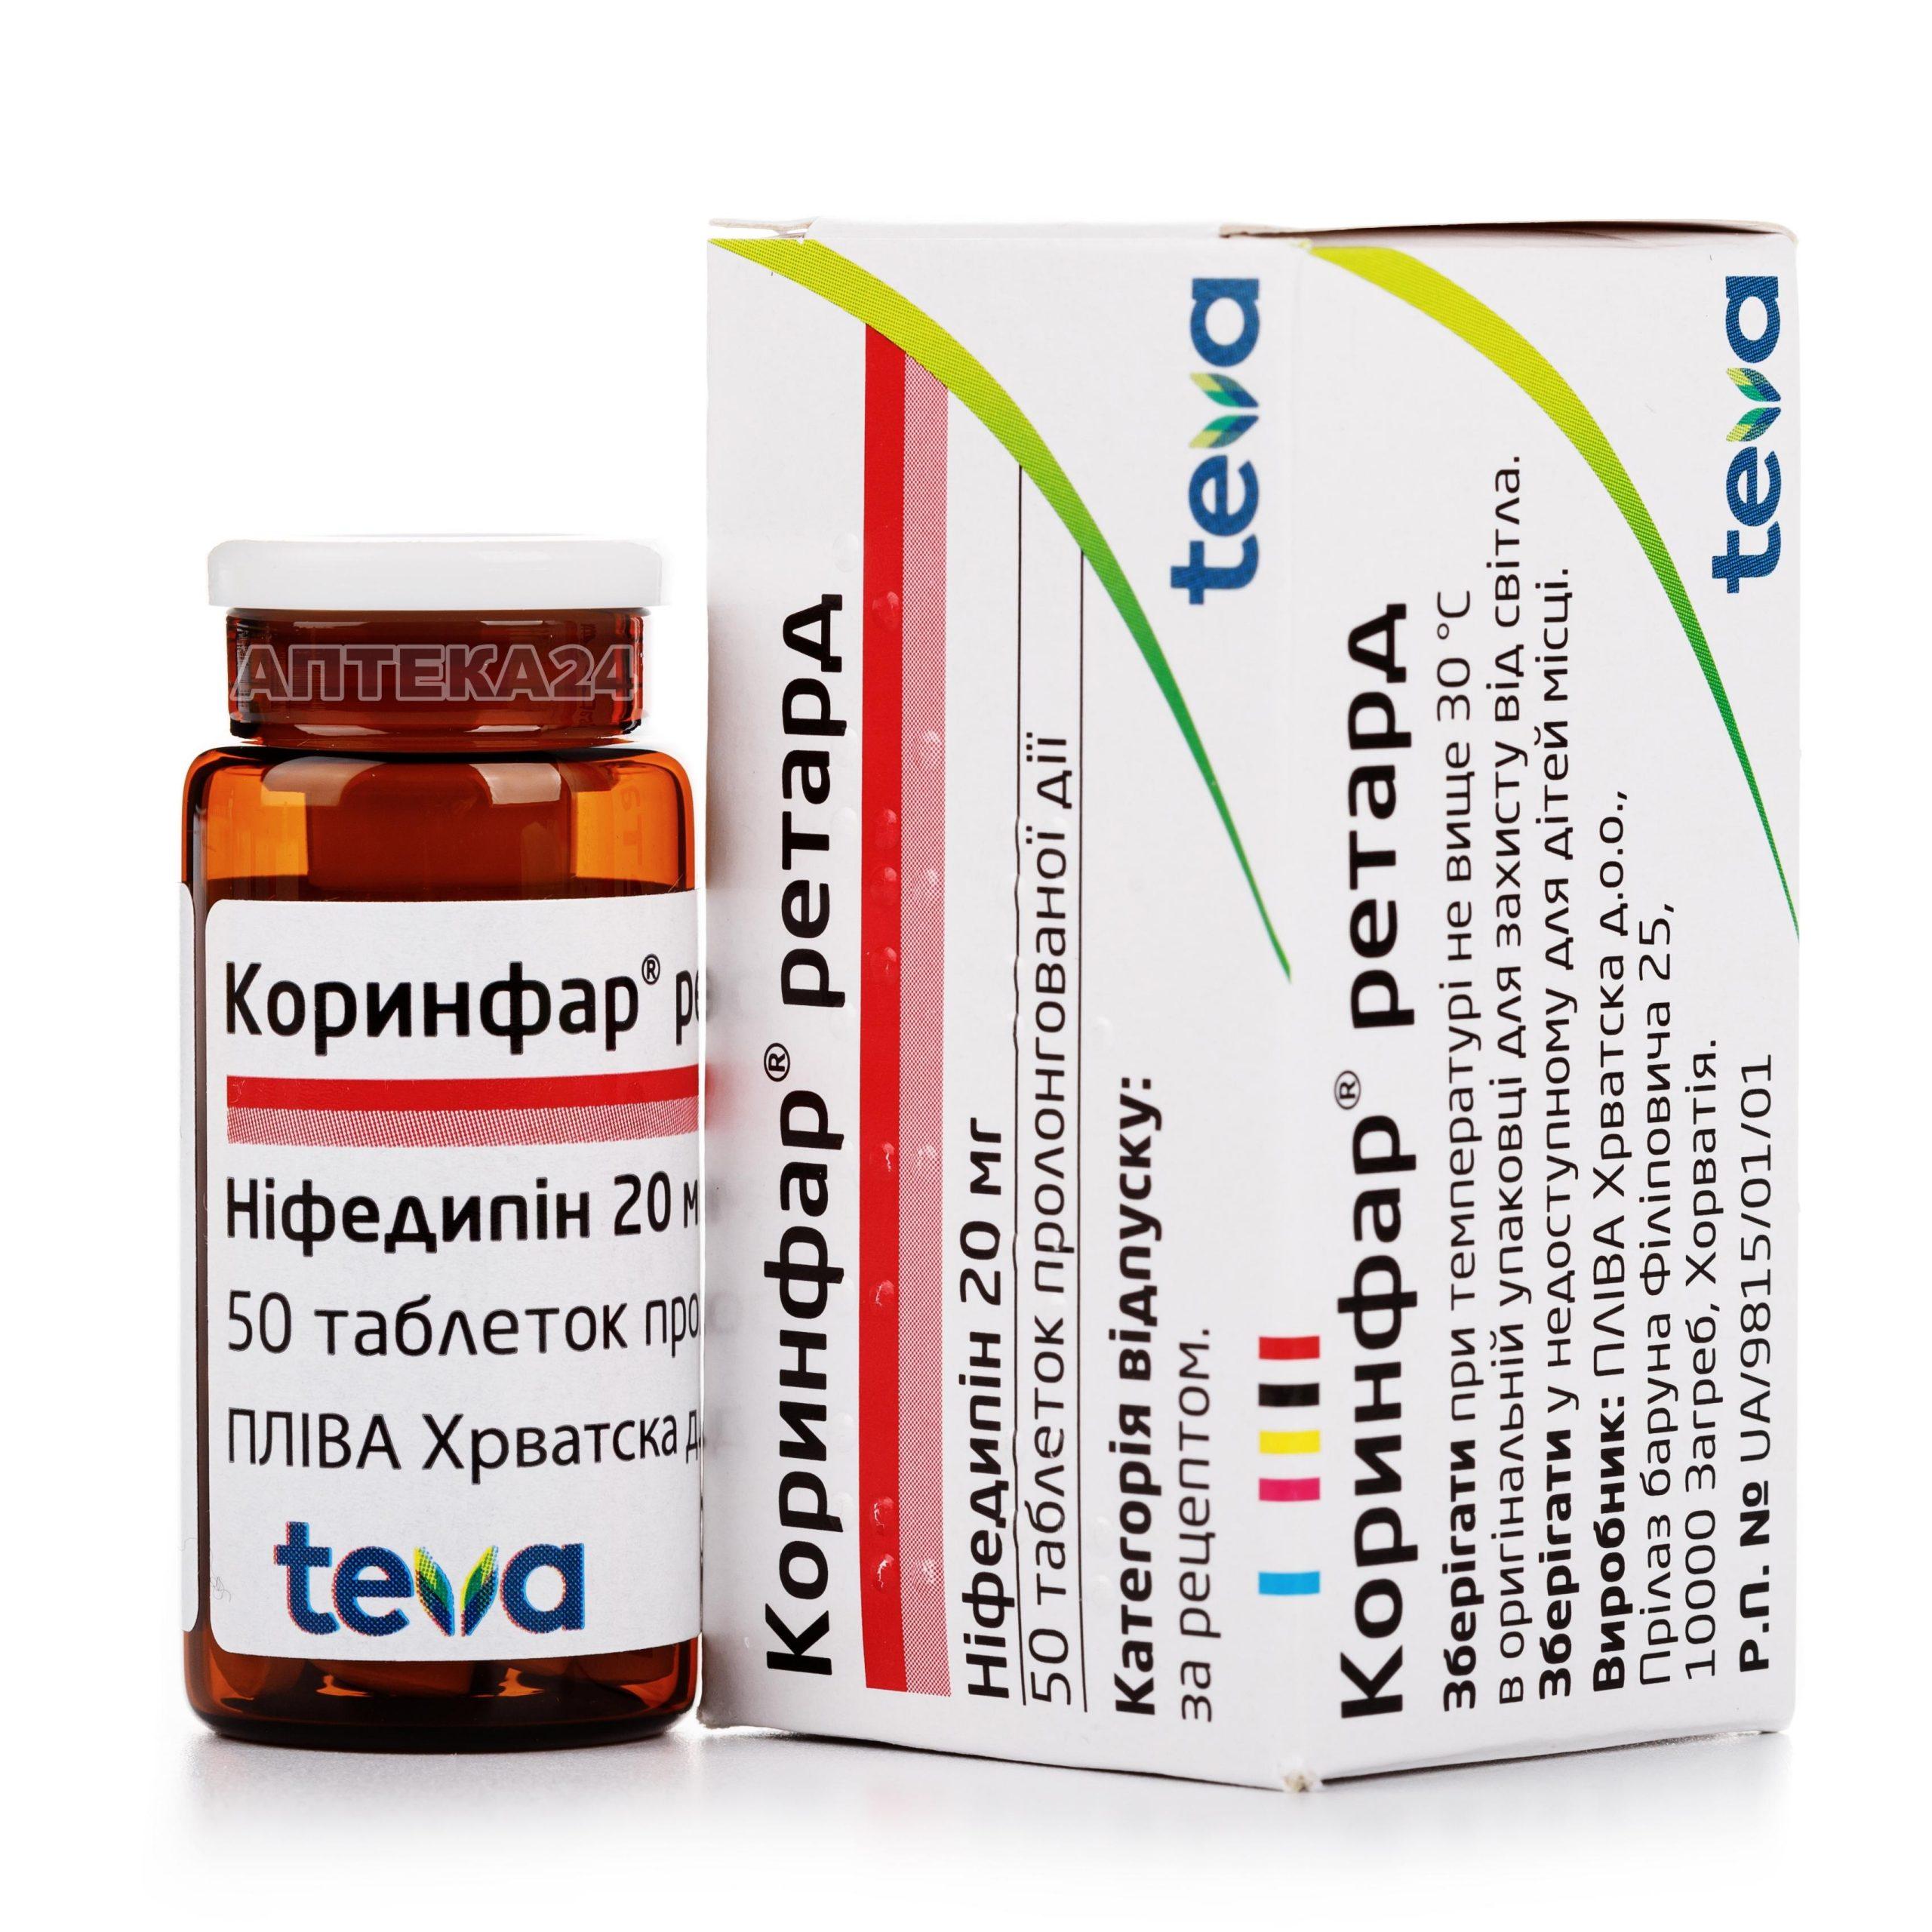 Коринфар ретард таблетки 20 мг N50_600616e33f9b0.jpeg